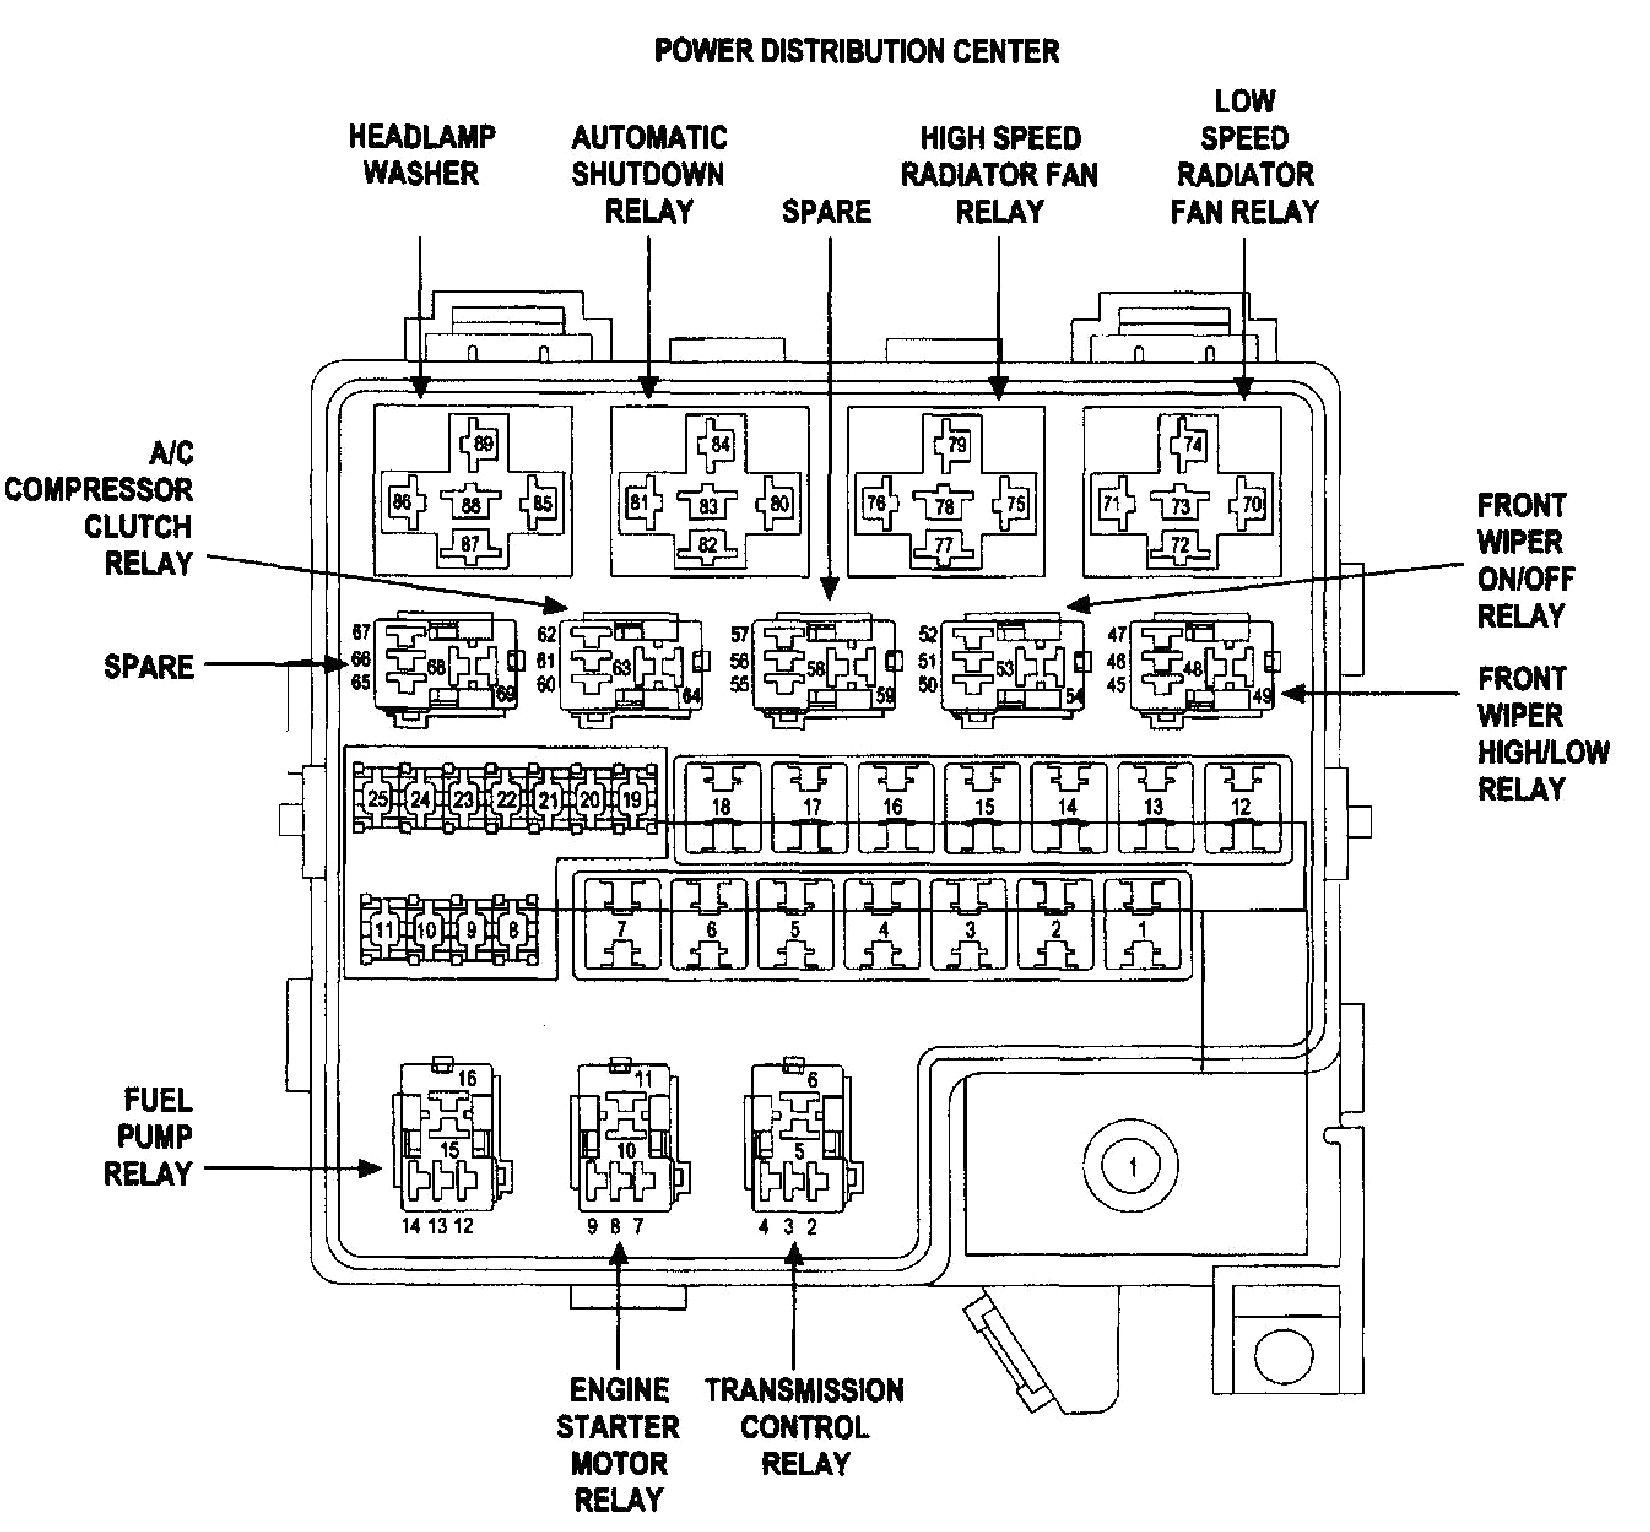 Fuse Box Diagram For Dodge Stratu